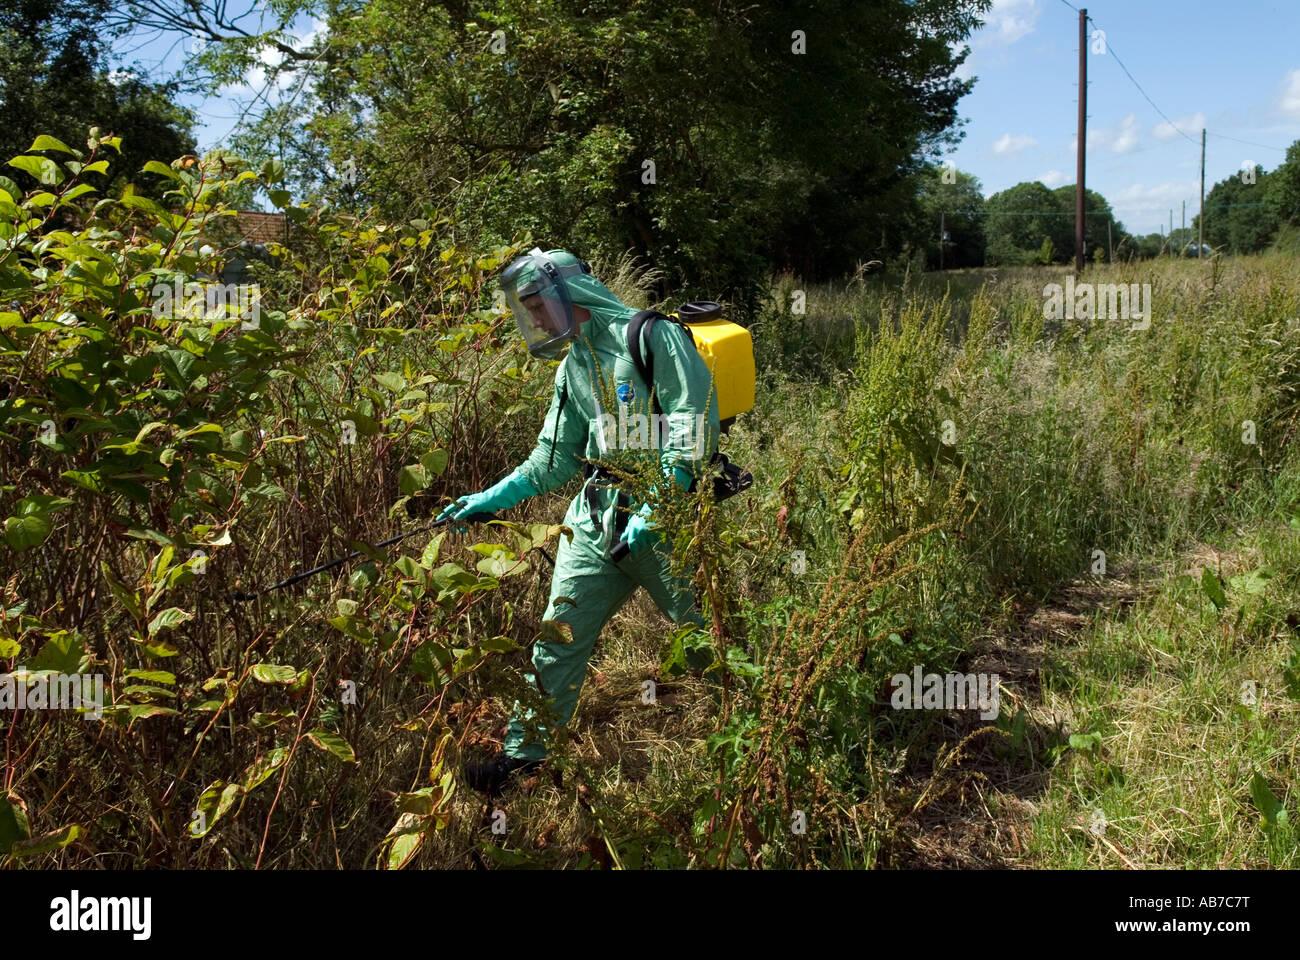 JAPANESE KNOTWEED. ERADICATION EXPERT sprays invasive Japanese Knotweed in Suffolk,England,UK Stock Photo